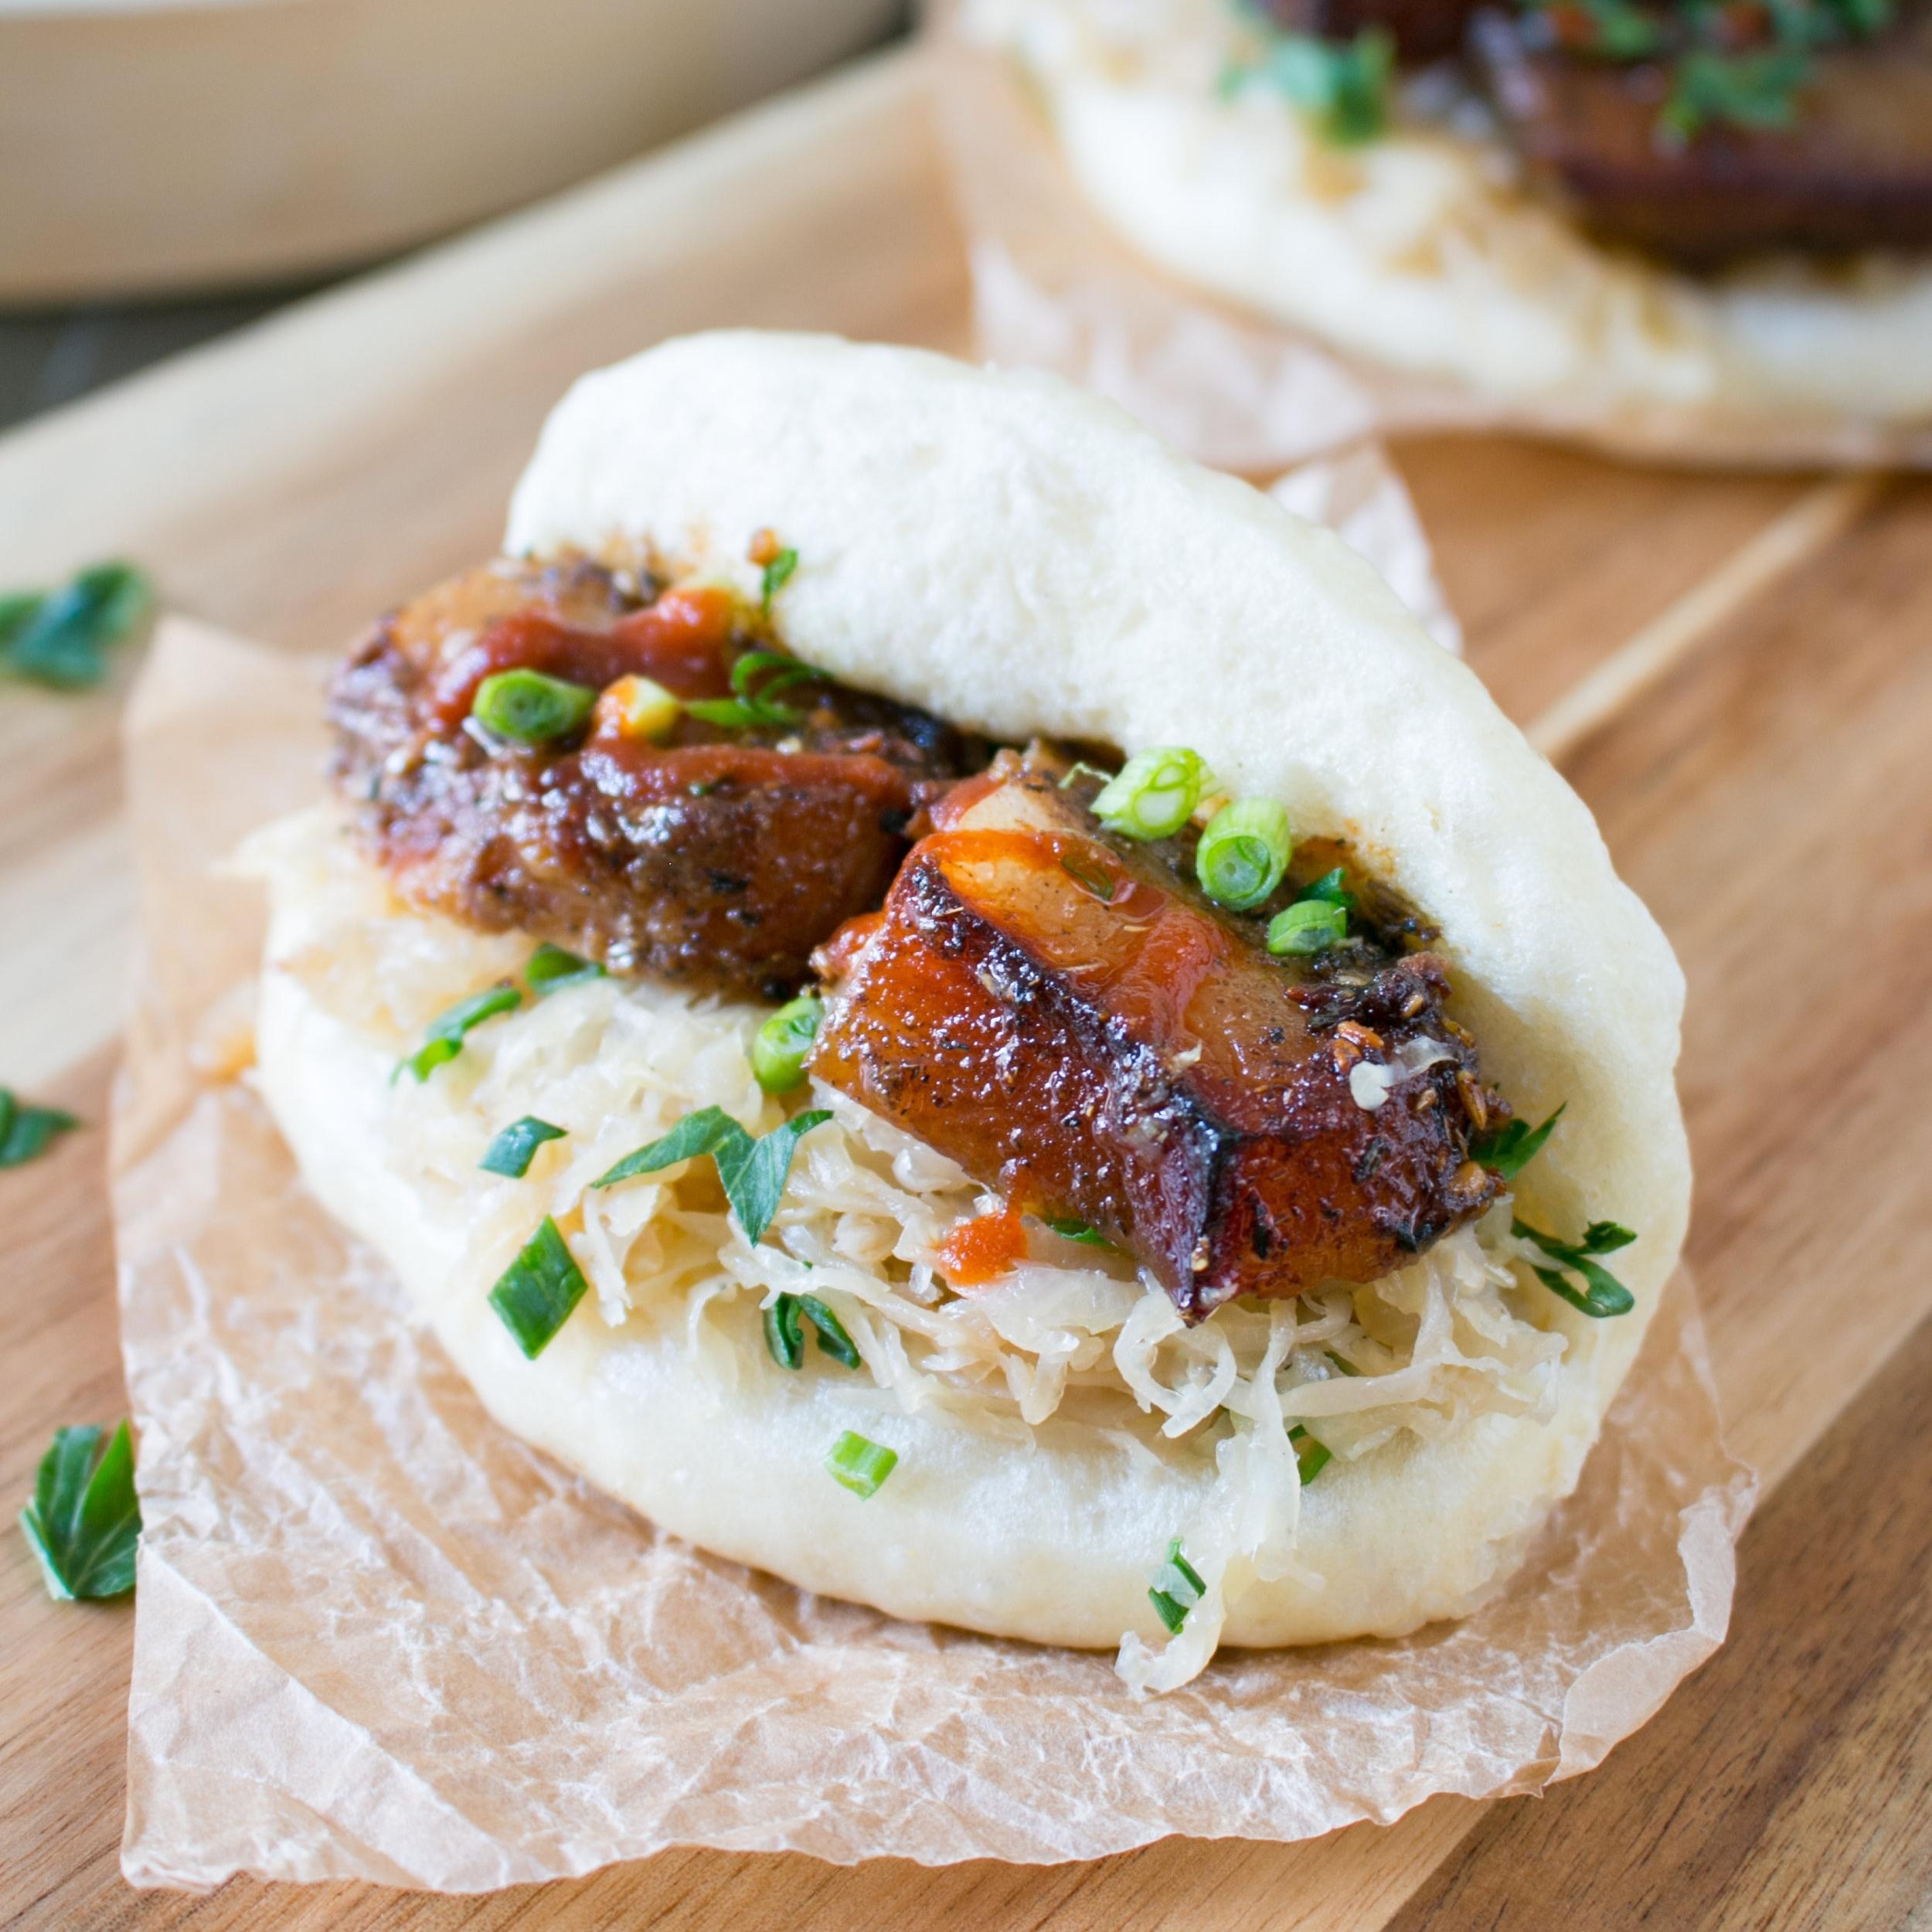 PORK - Watermelon + Pork Belly SkewersSteamed Buns with Asian Pork BellyMini Meatballs with Basil Walnut PestoMini Pork Carnita TacosMini Pulled Pork Sliders with Slaw + Pickles